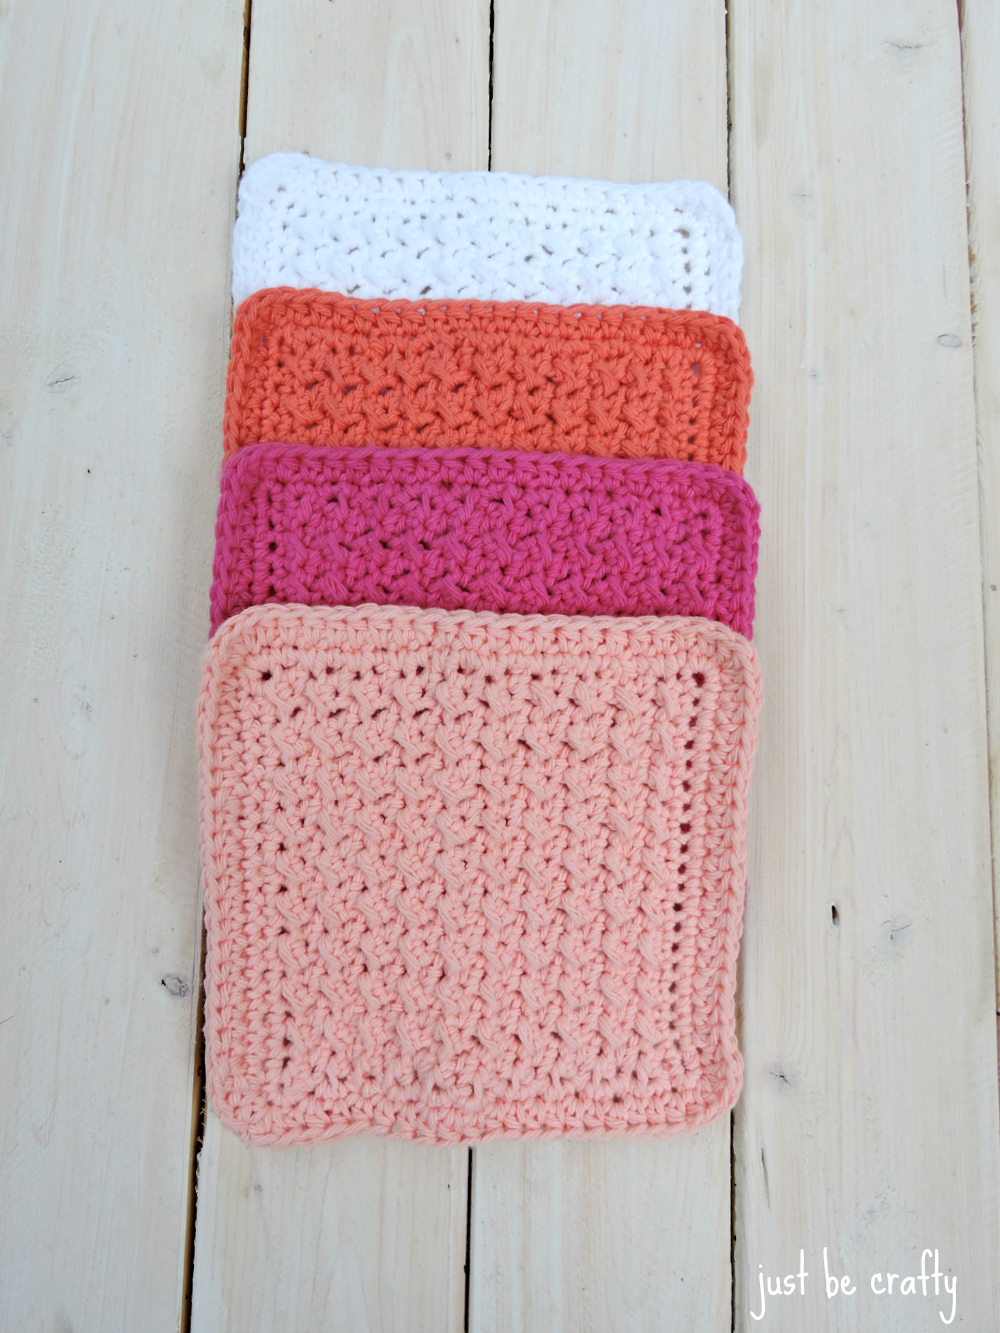 Crochet Cabin Dishcloth Pattern